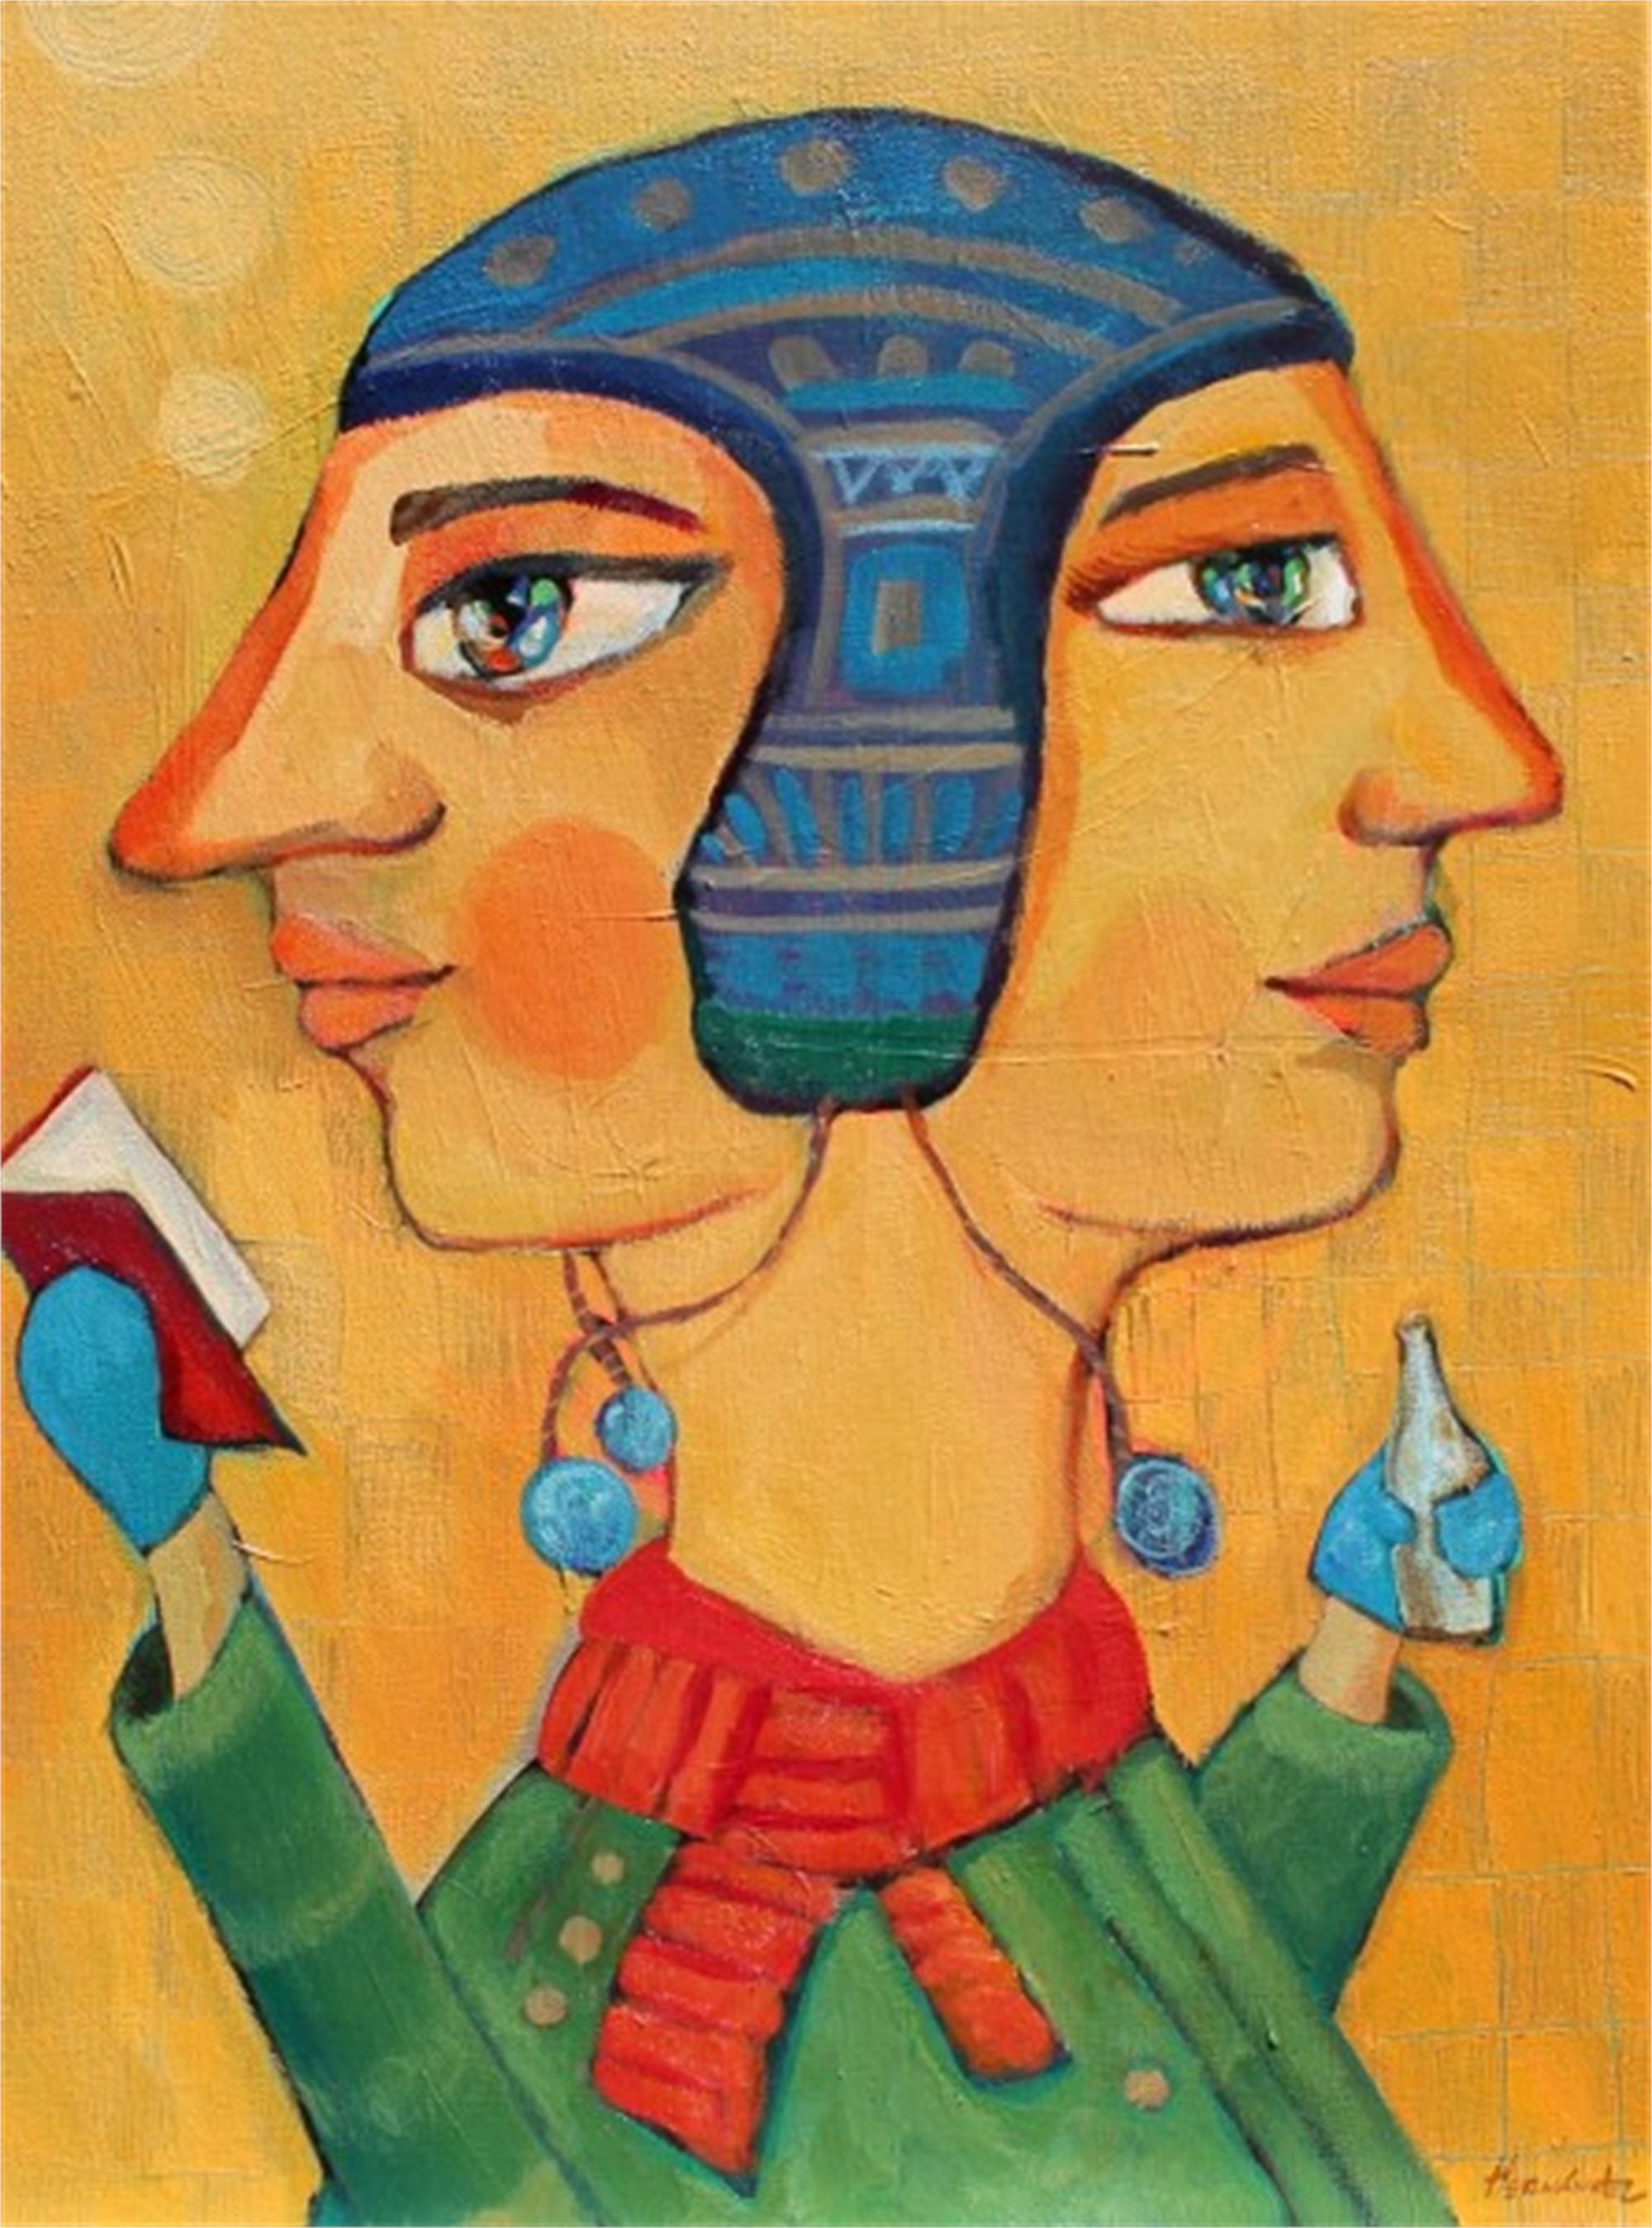 Twins by William Hernandez